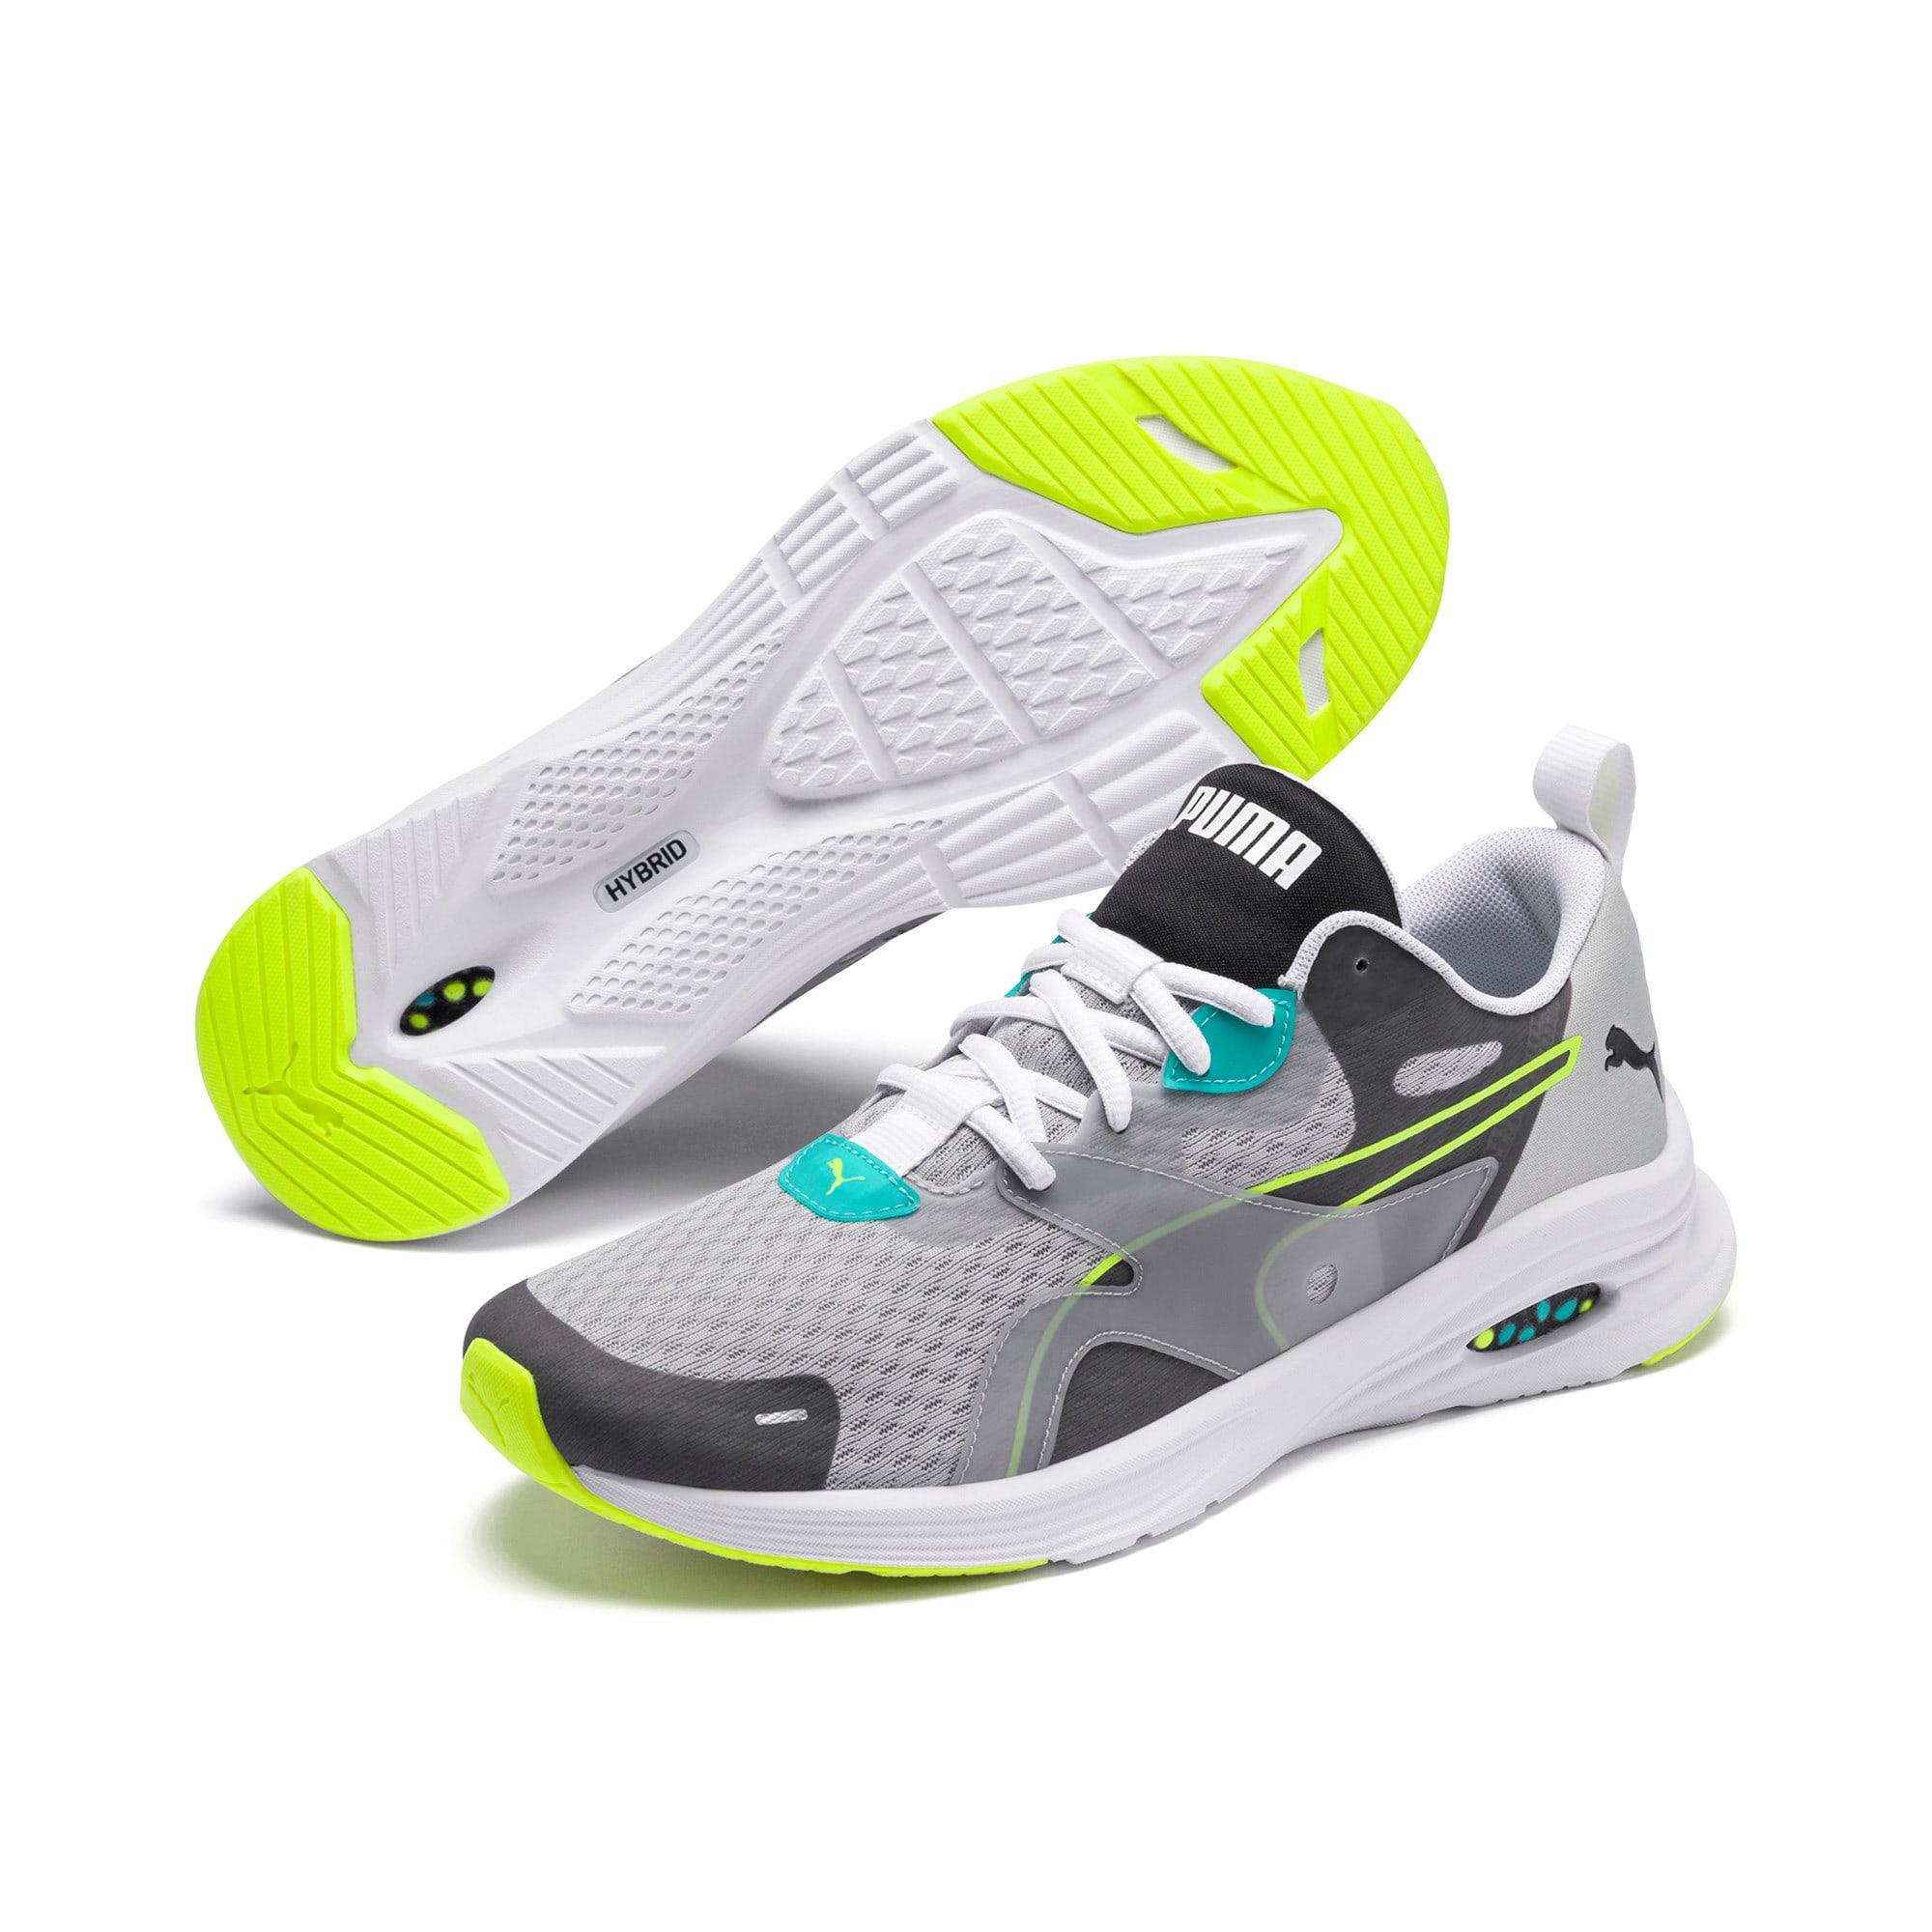 Miniatura 2 de Zapatos para correr HYBRID Fuego para hombre, High Rise-Blue Turquoise, mediano